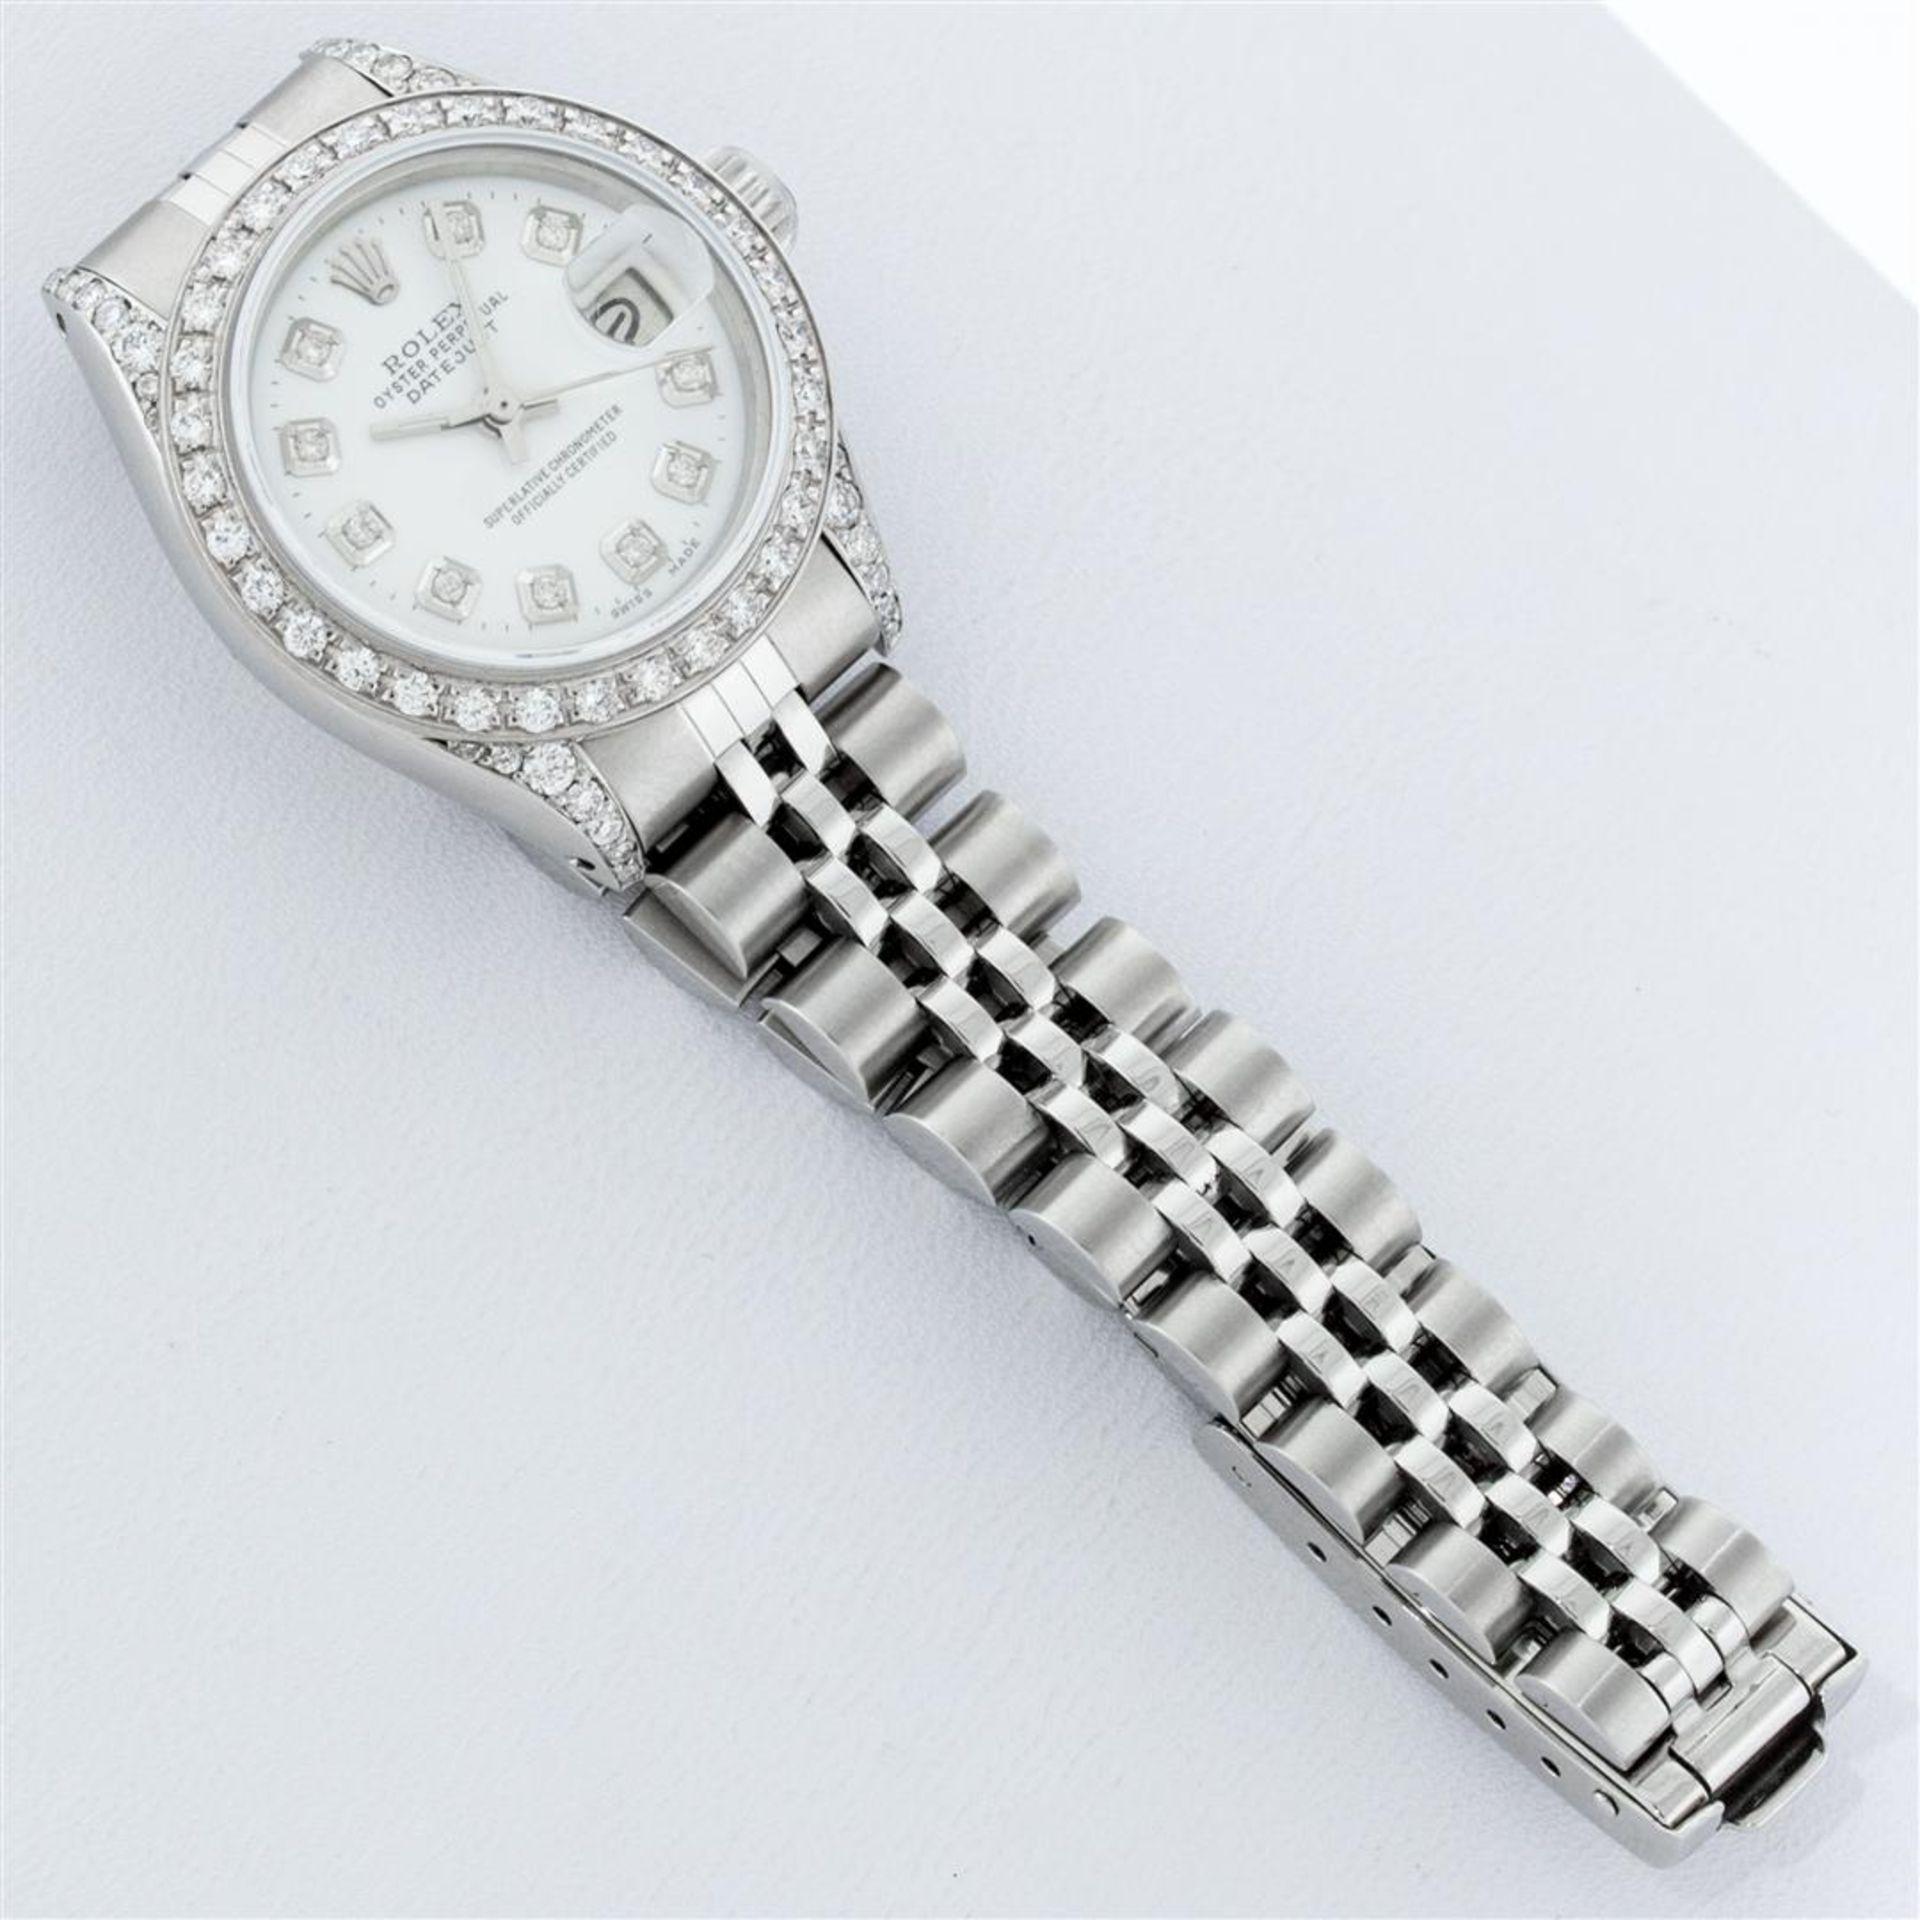 Rolex Ladies Stainless Steel White Diamond Lugs & Datejust Wristwatch - Image 6 of 9